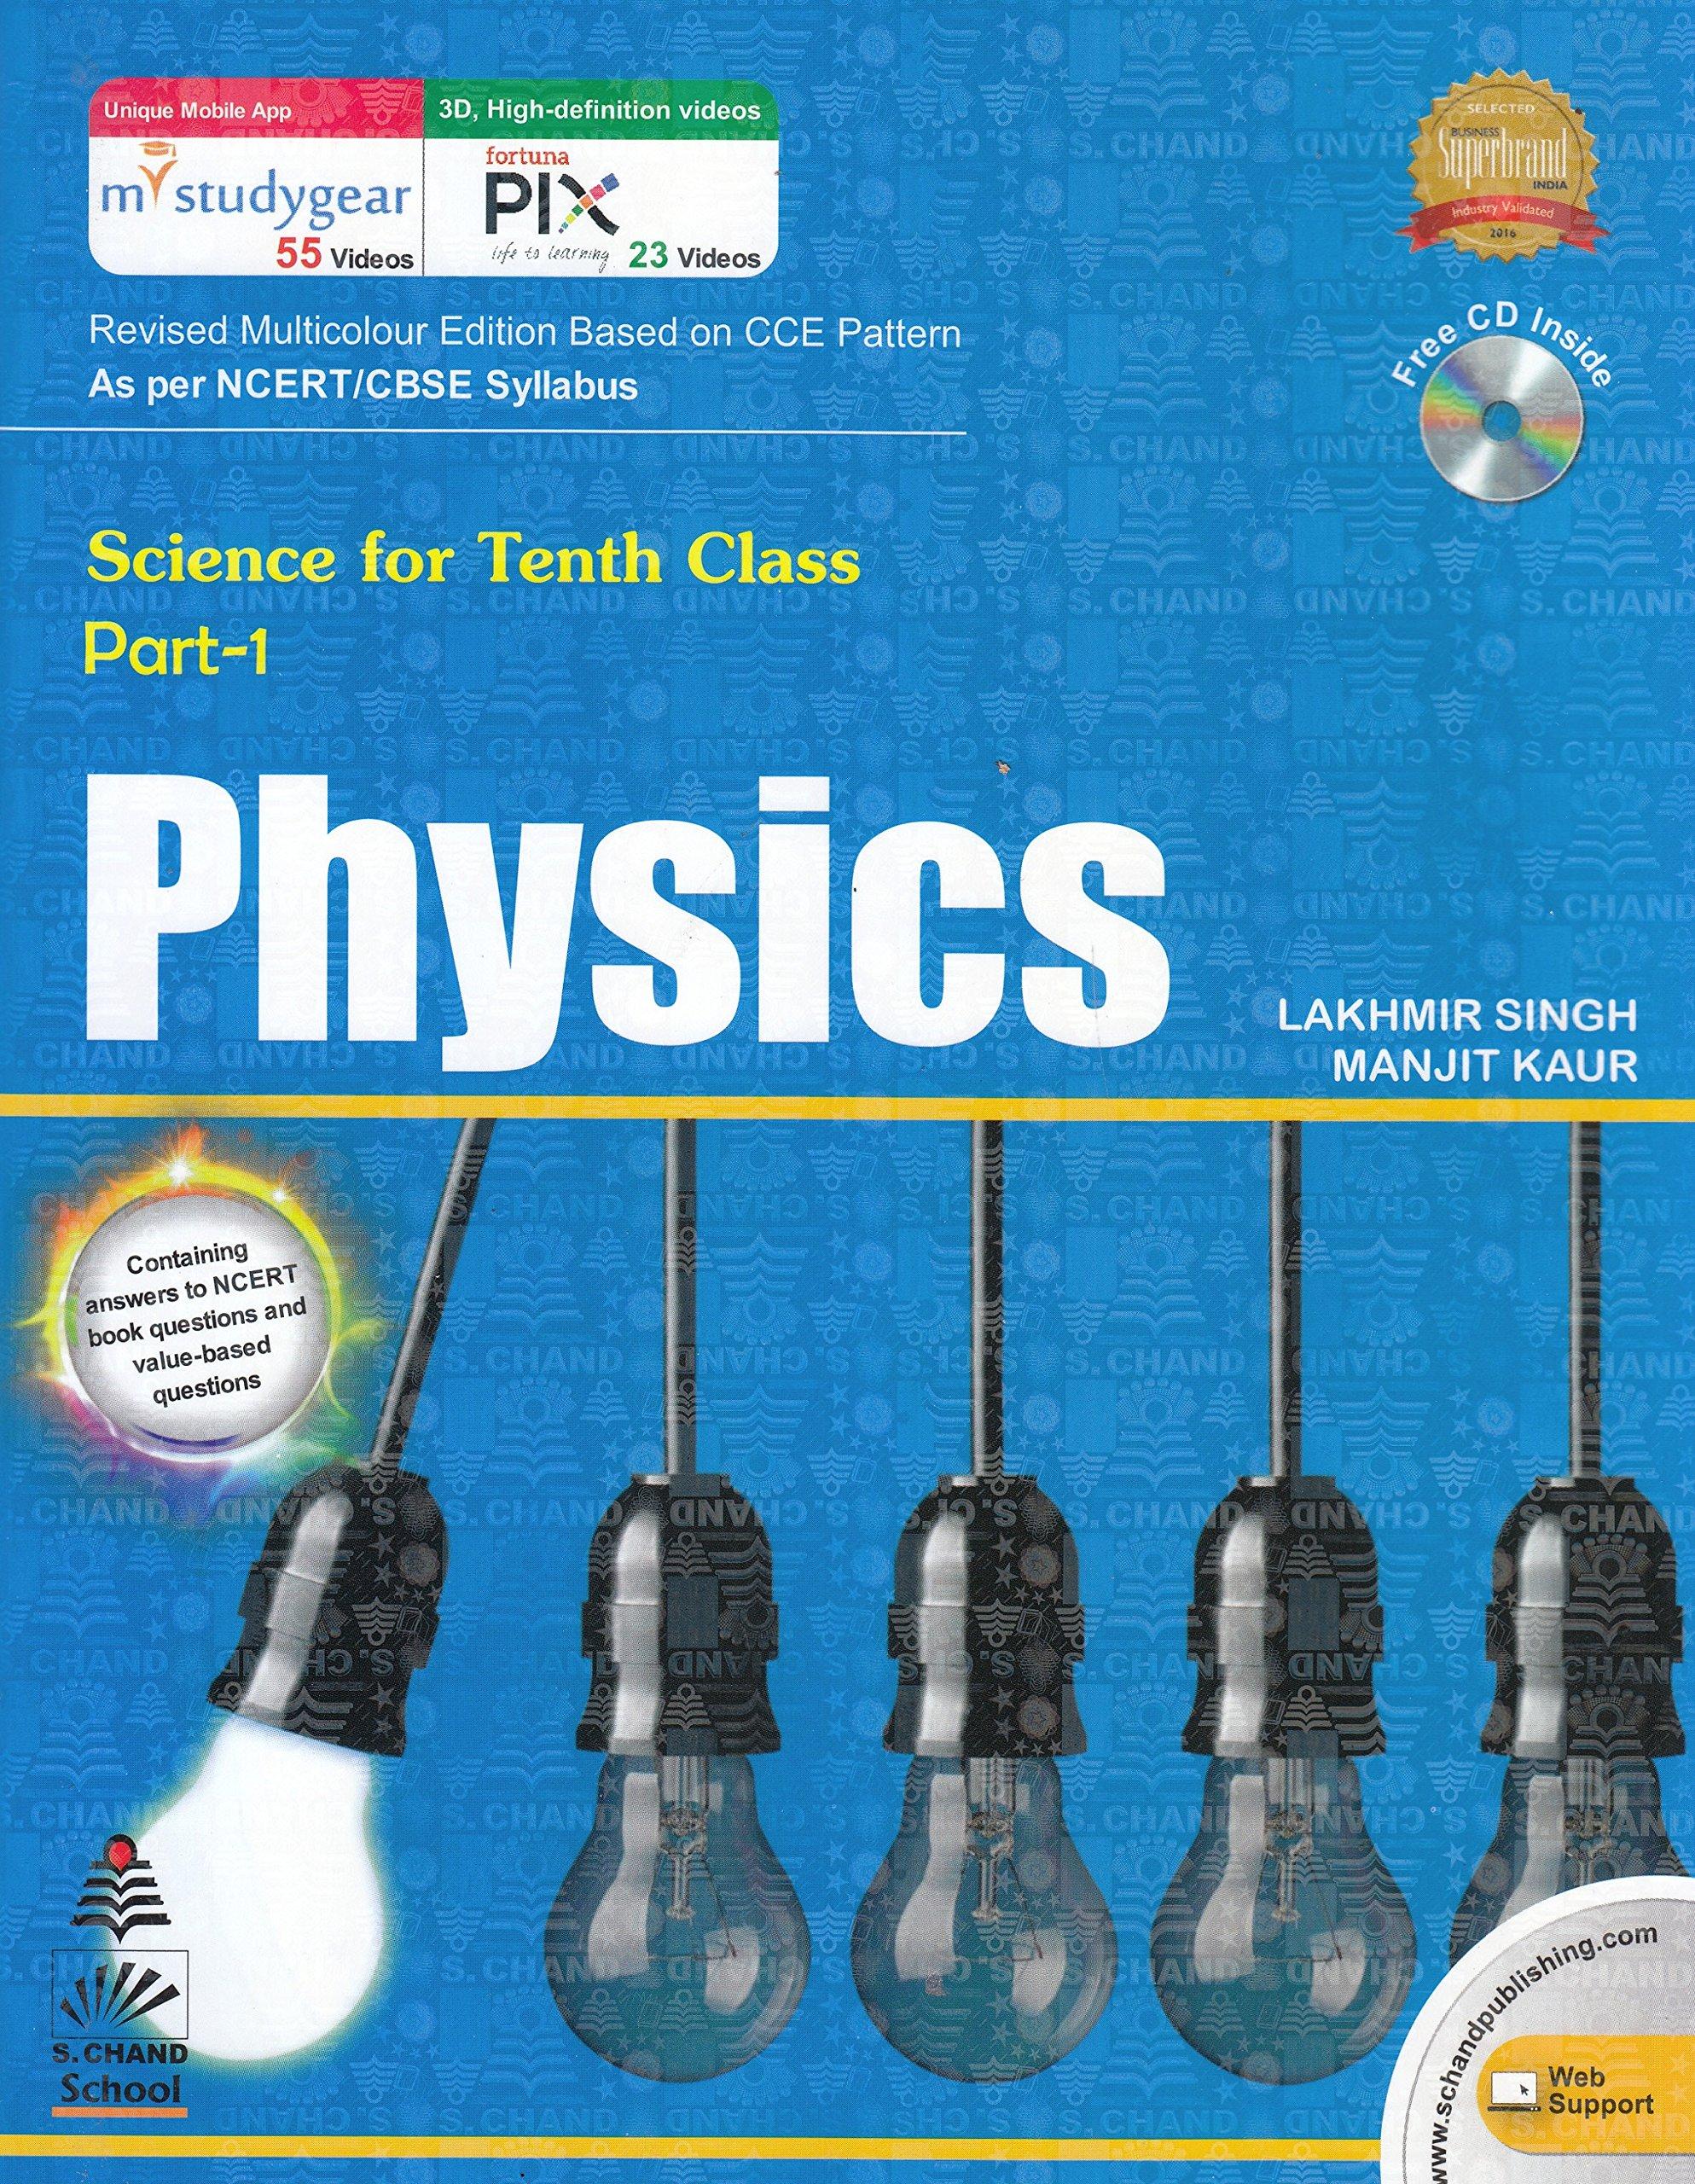 Science For Tenth Class Part 1 Physics W/Cd : Cbse: Manjit Kaur (Author)  Lakhmir Singh (Author): 9789352530489: Amazon.com: Books